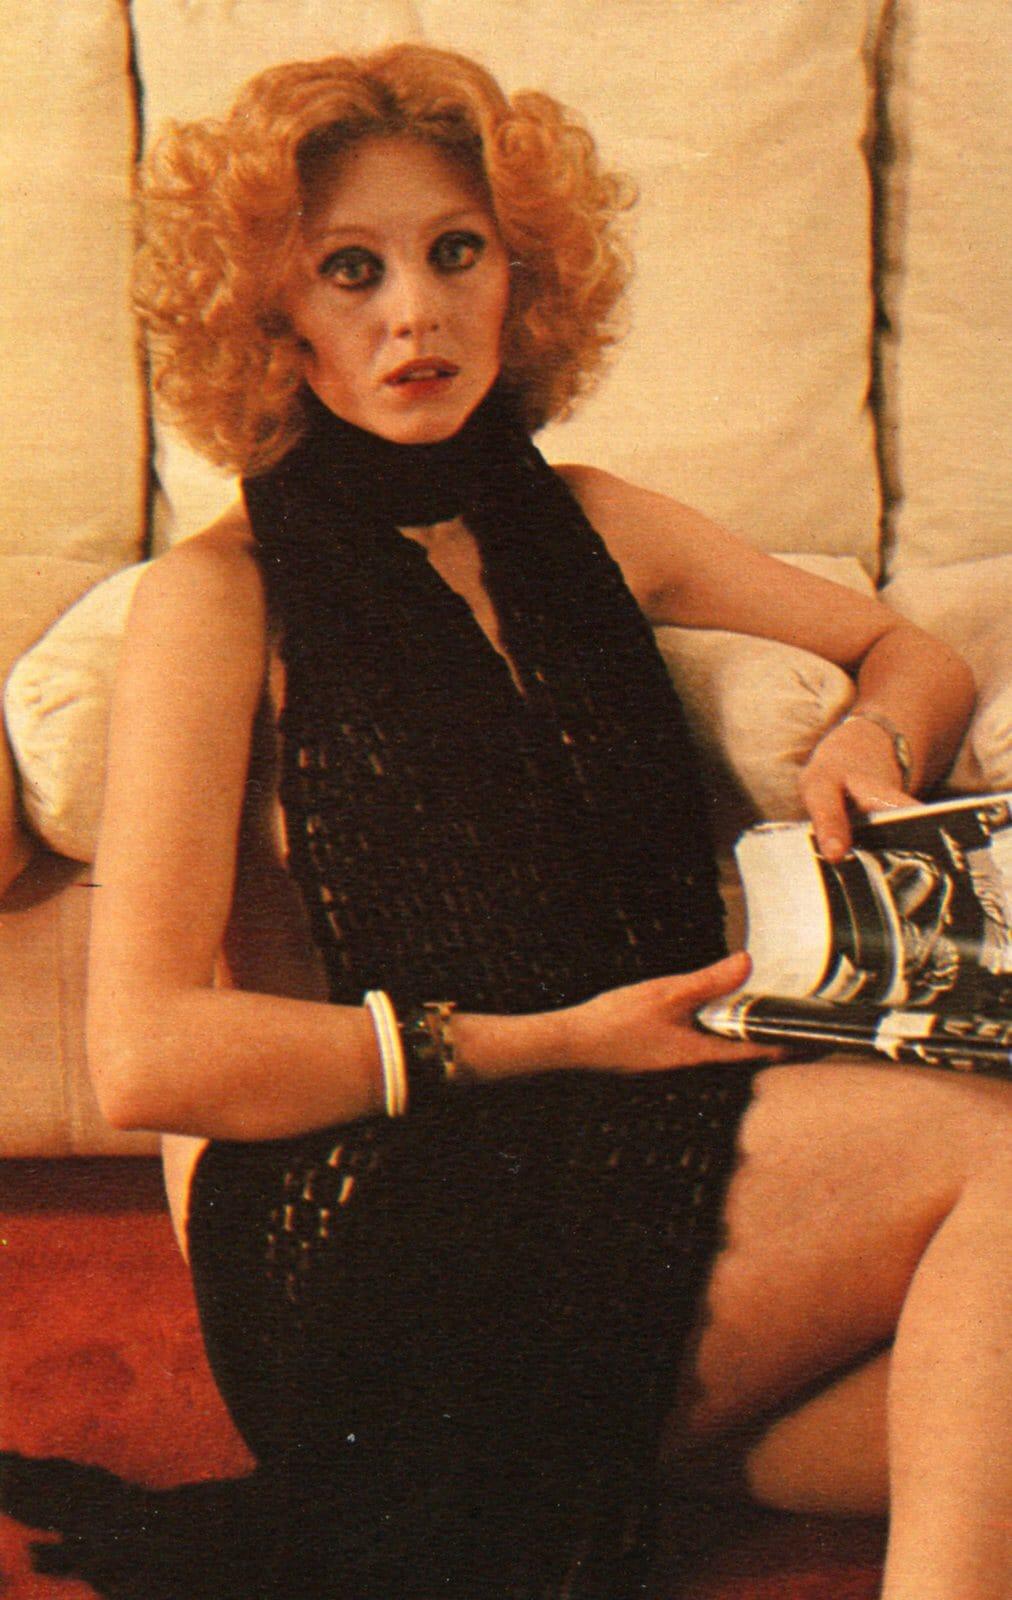 Carol Dempster,Lesley-Anne Down XXX pics Aamina Sheikh,Morwenna Banks